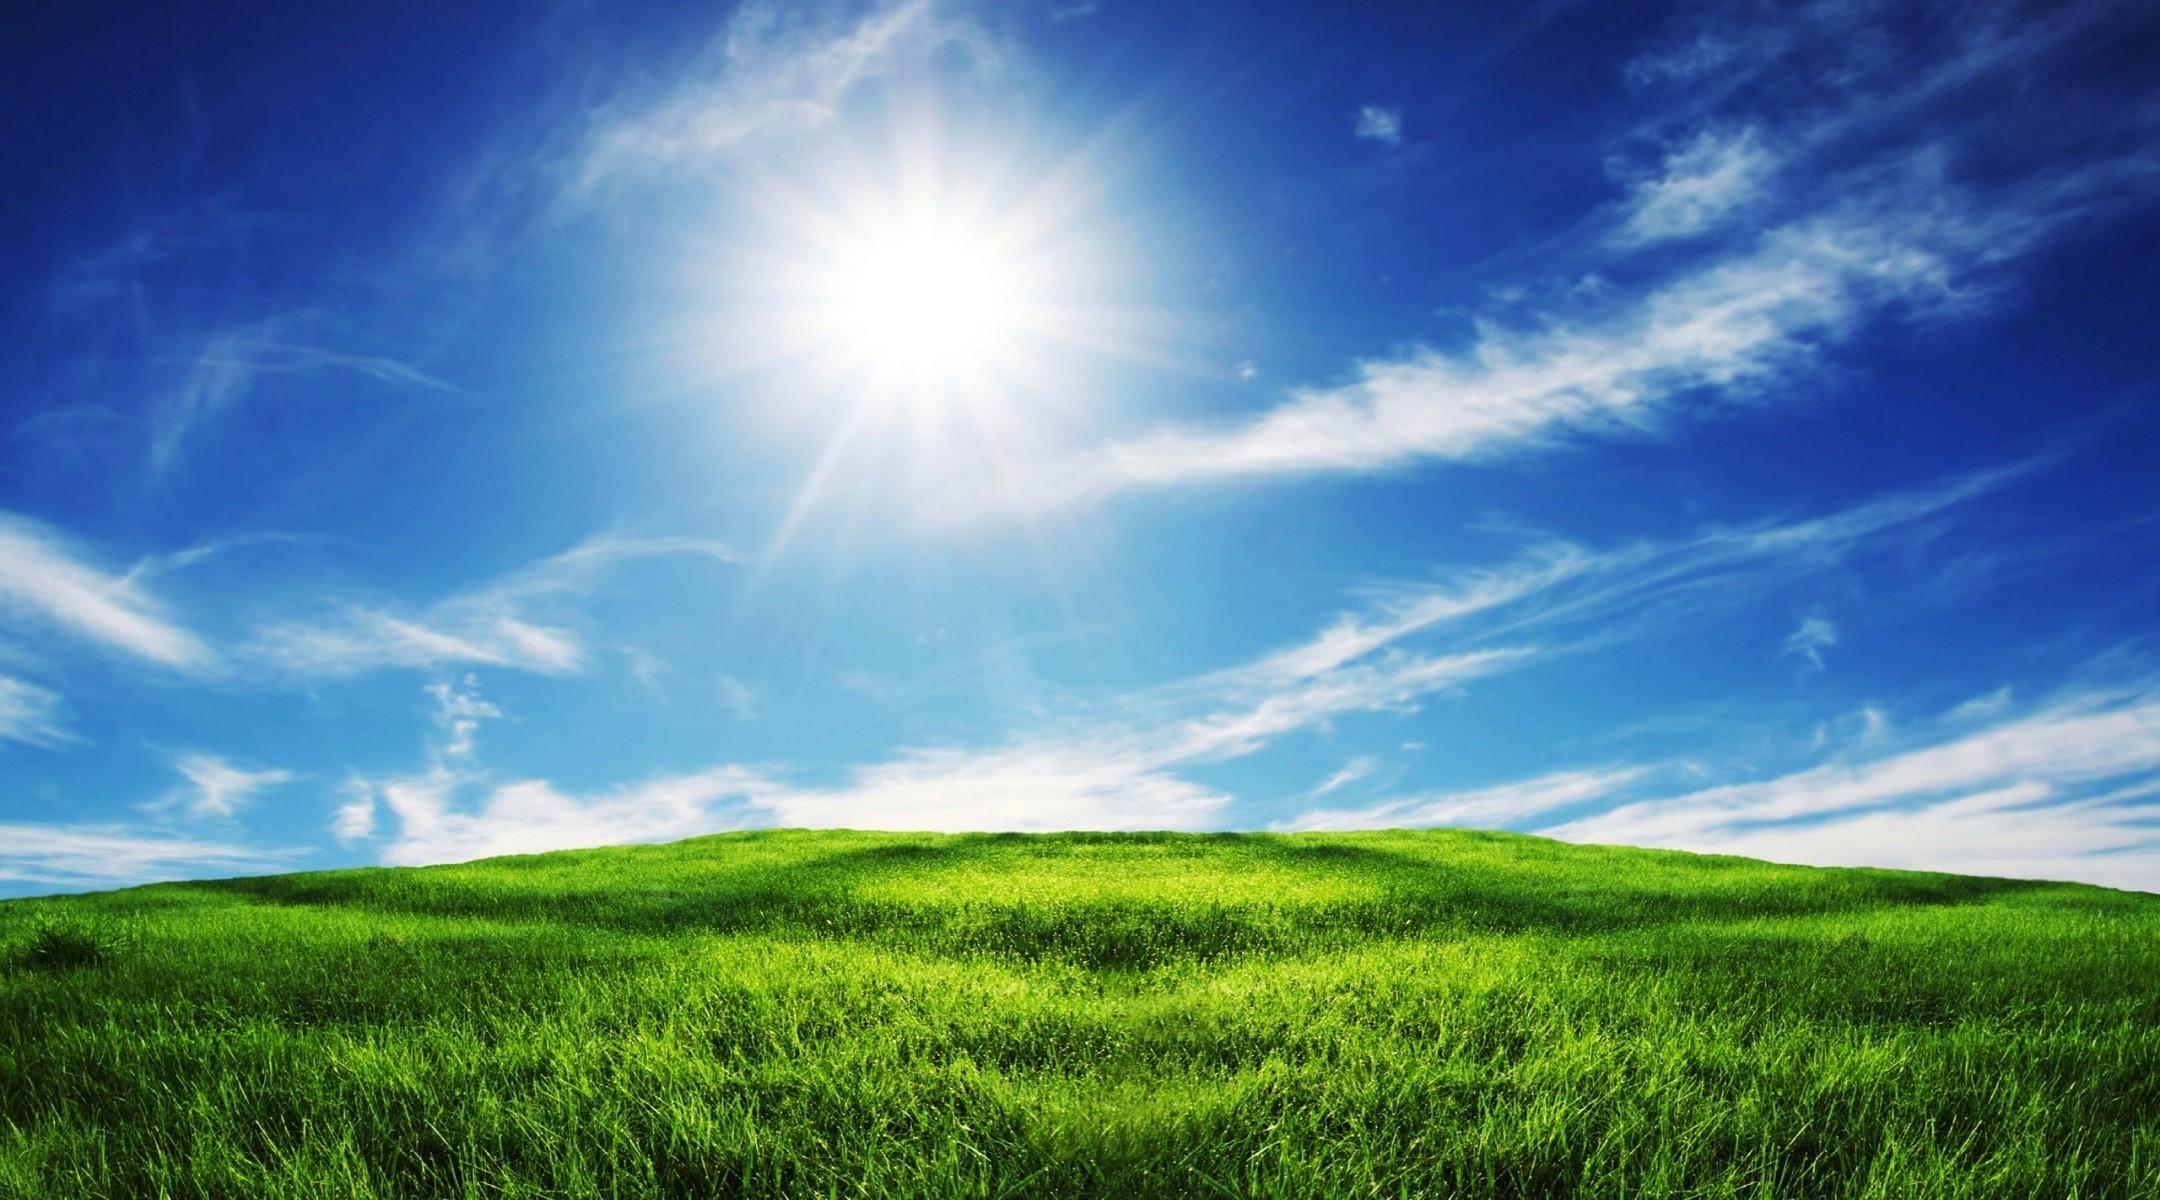 Sunny Day Background - WallpaperSafari